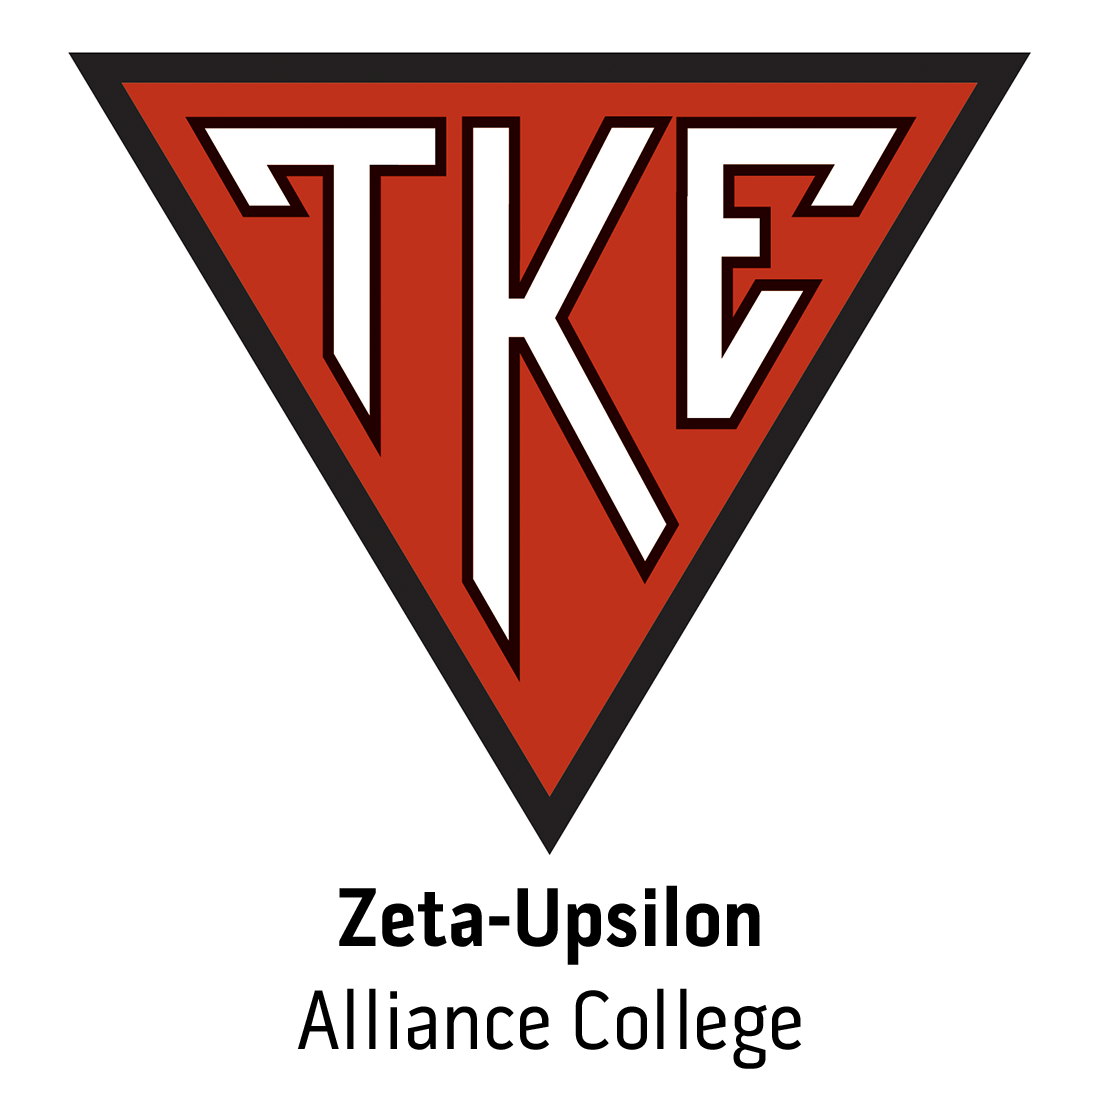 Zeta-Upsilon Chapter at Alliance College